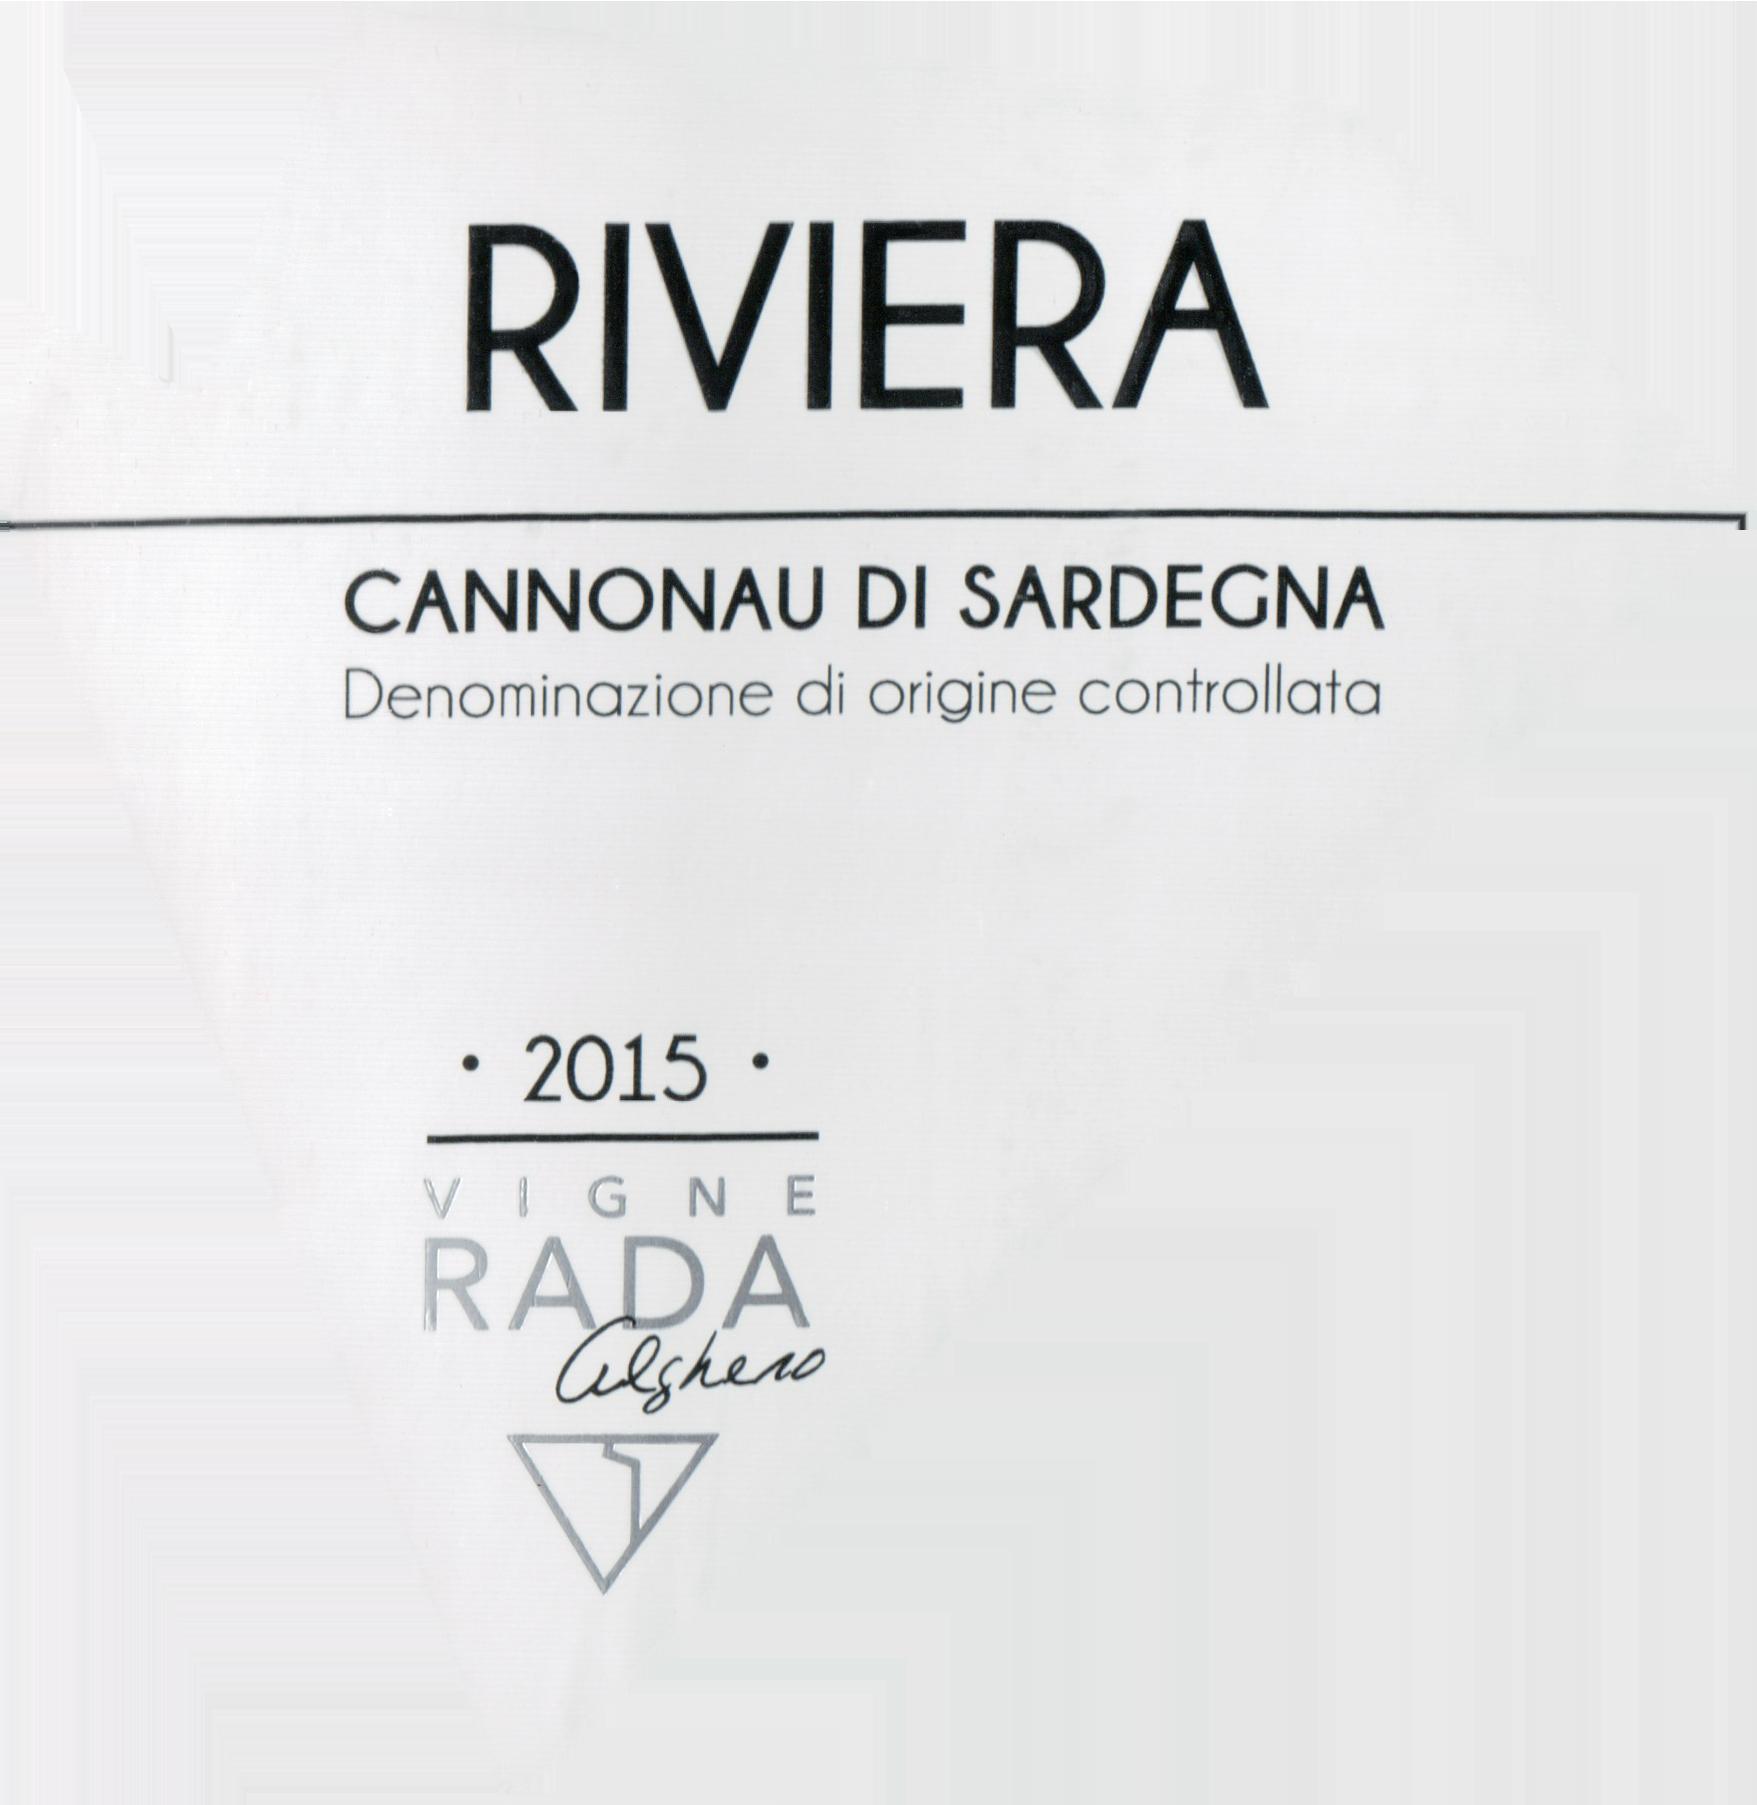 Vigne Rada Cannonau Di Sardegna 2015